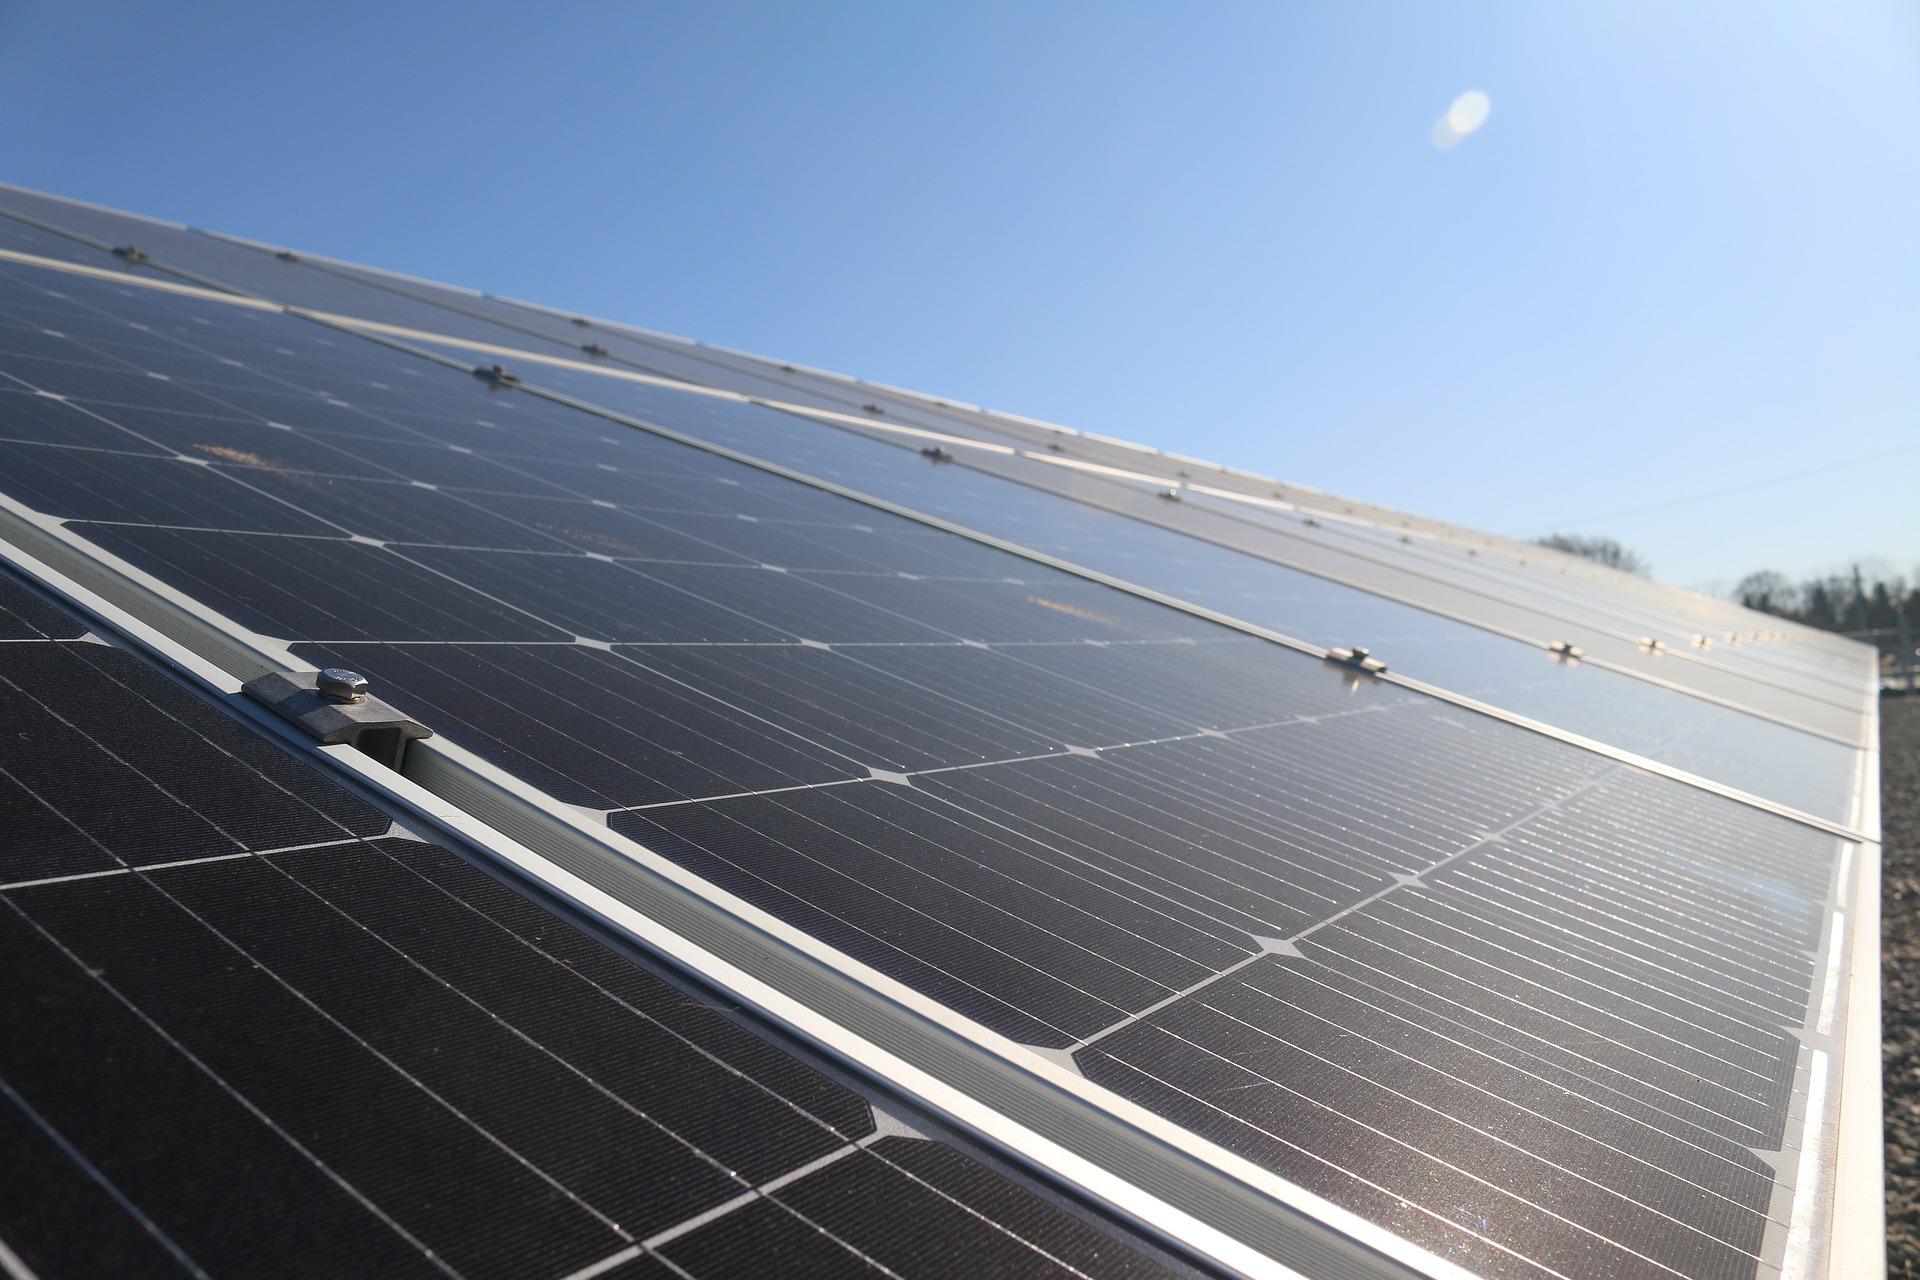 Periodieke inspectie zonnepanelen pv systeem